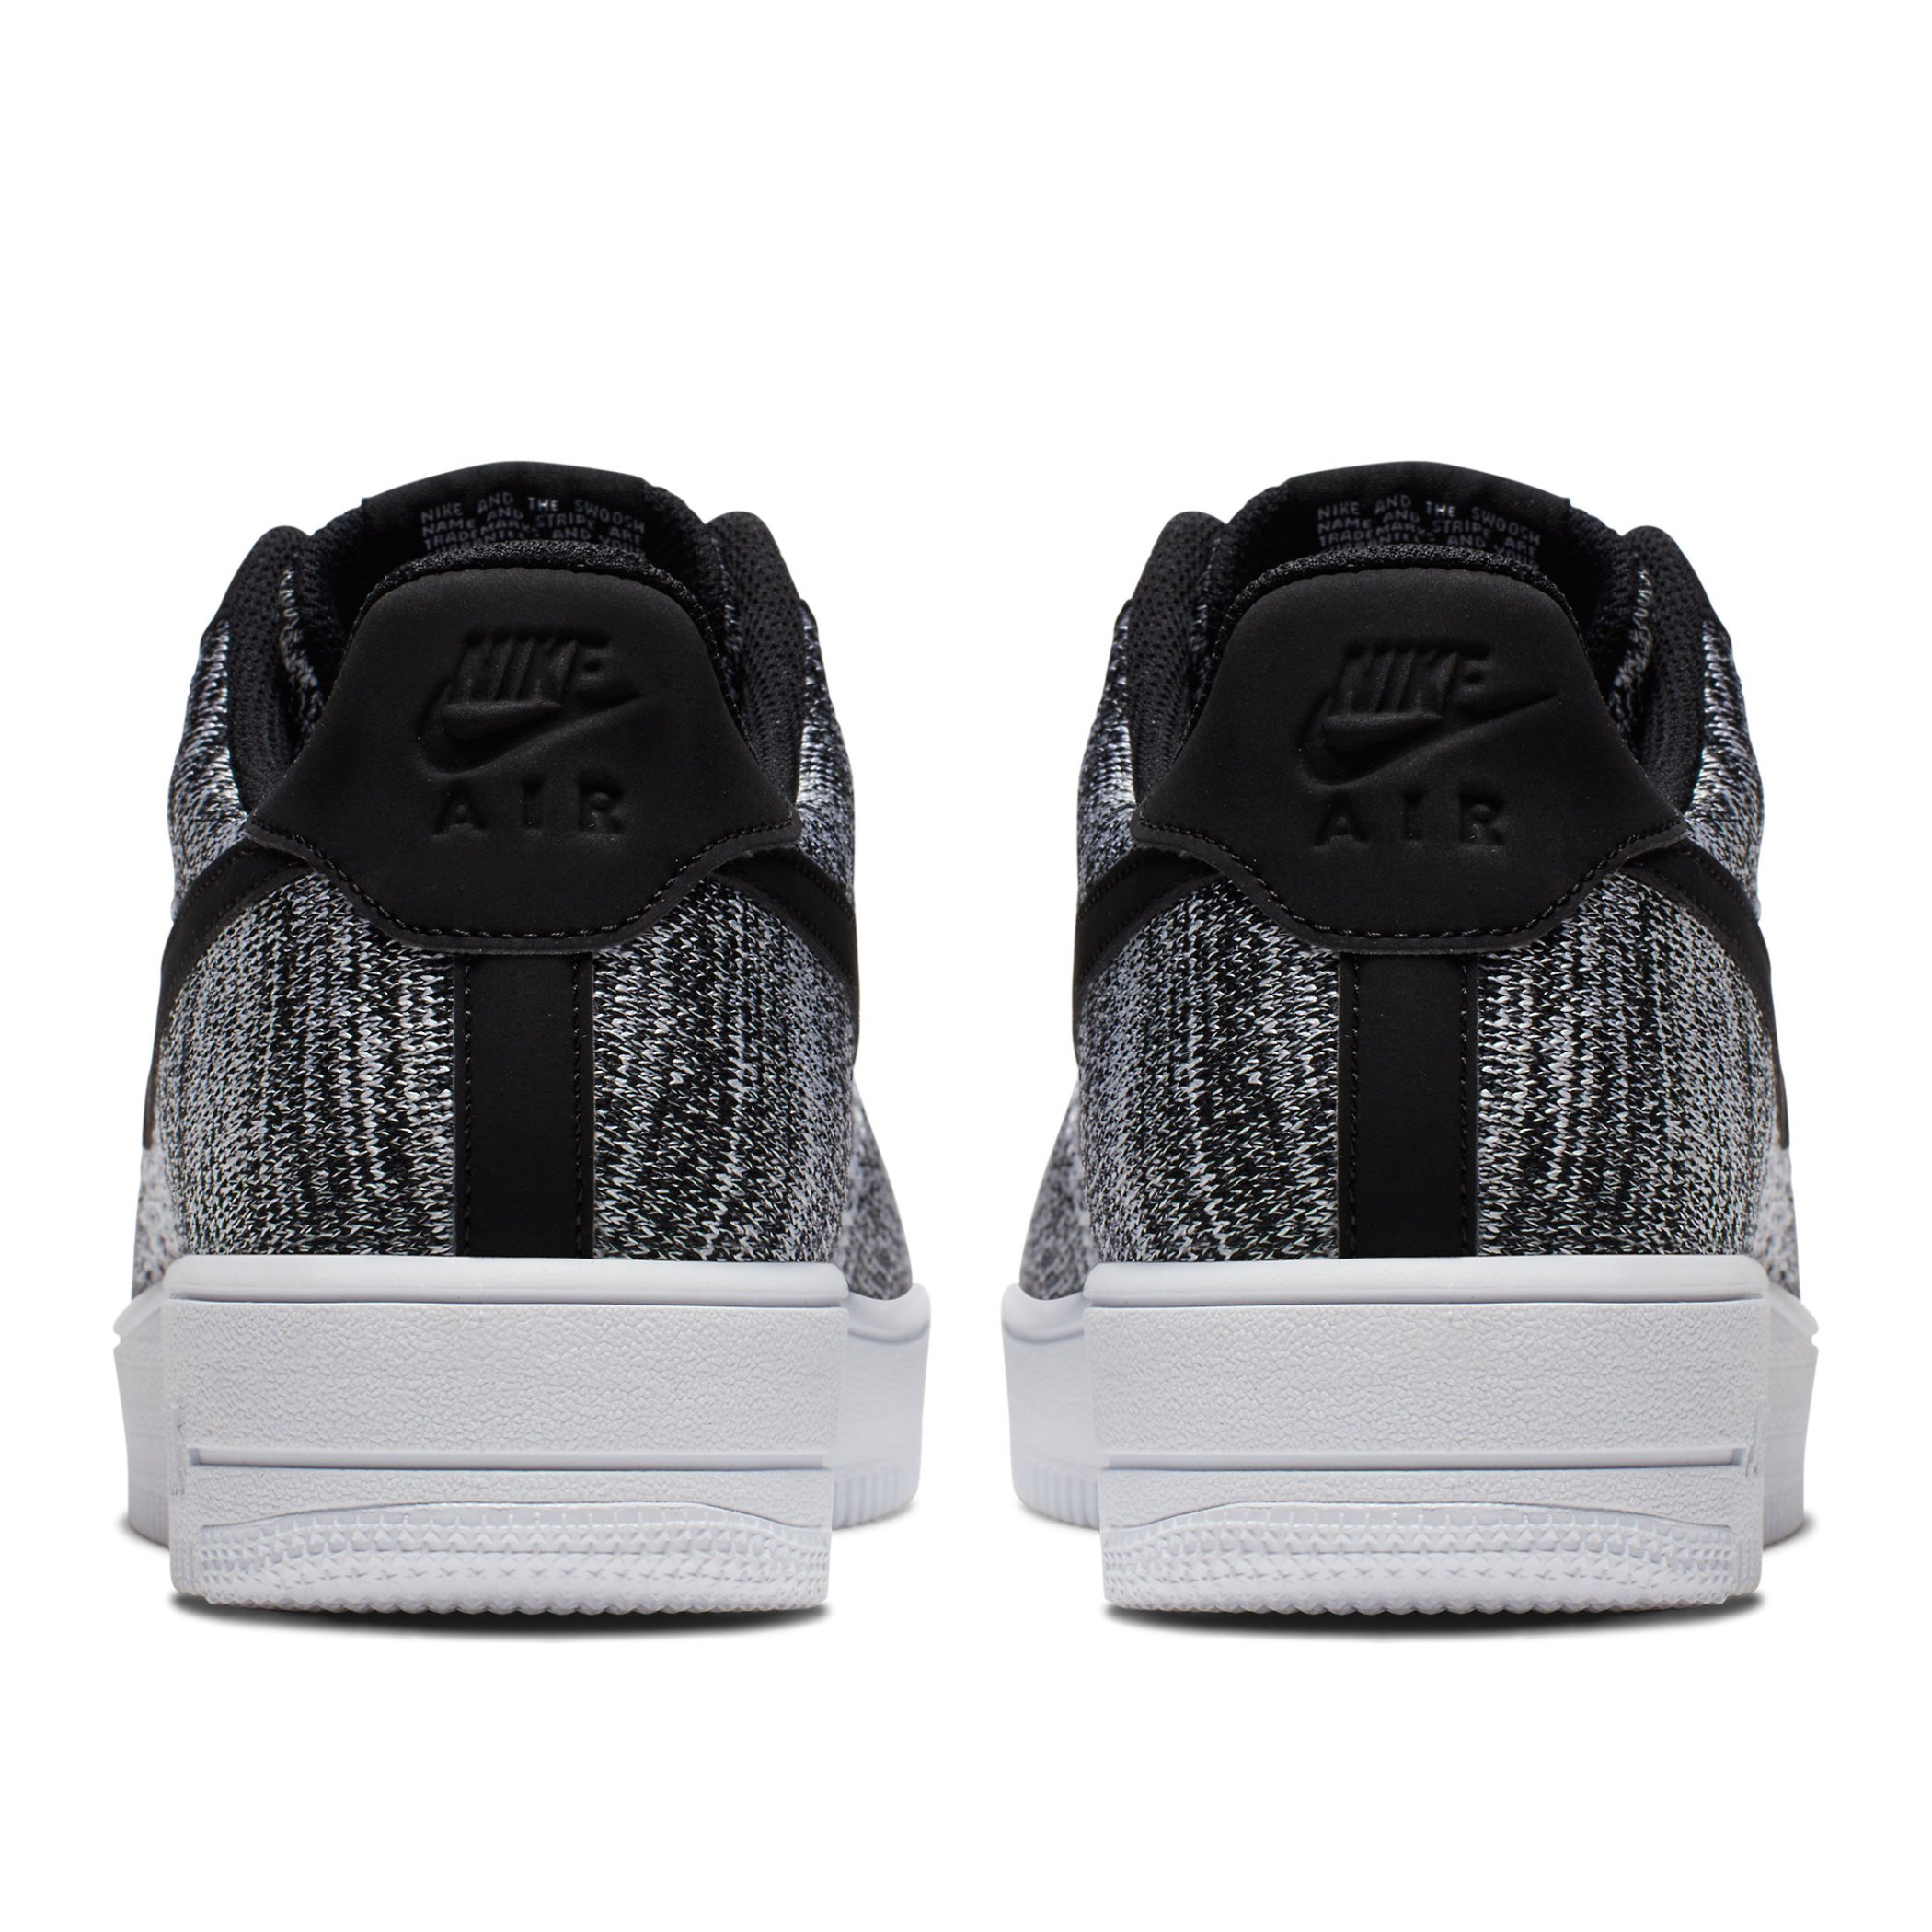 68484a72 Кроссовки Nike Air Force 1 Flyknit 2.0 Black/Pure Platinum-Black-White -